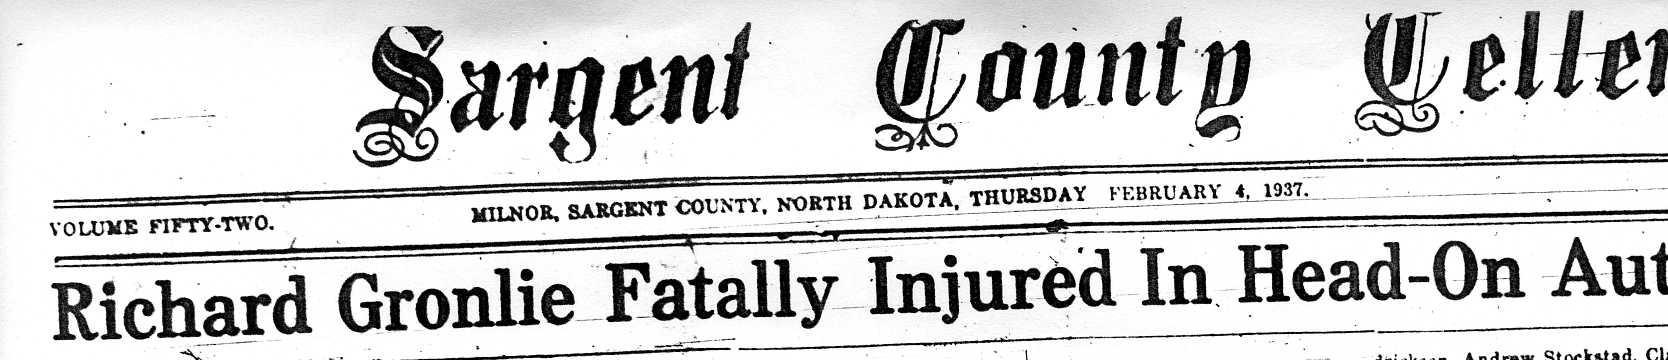 Sargent County North Dakota GenWeb- Obituaries